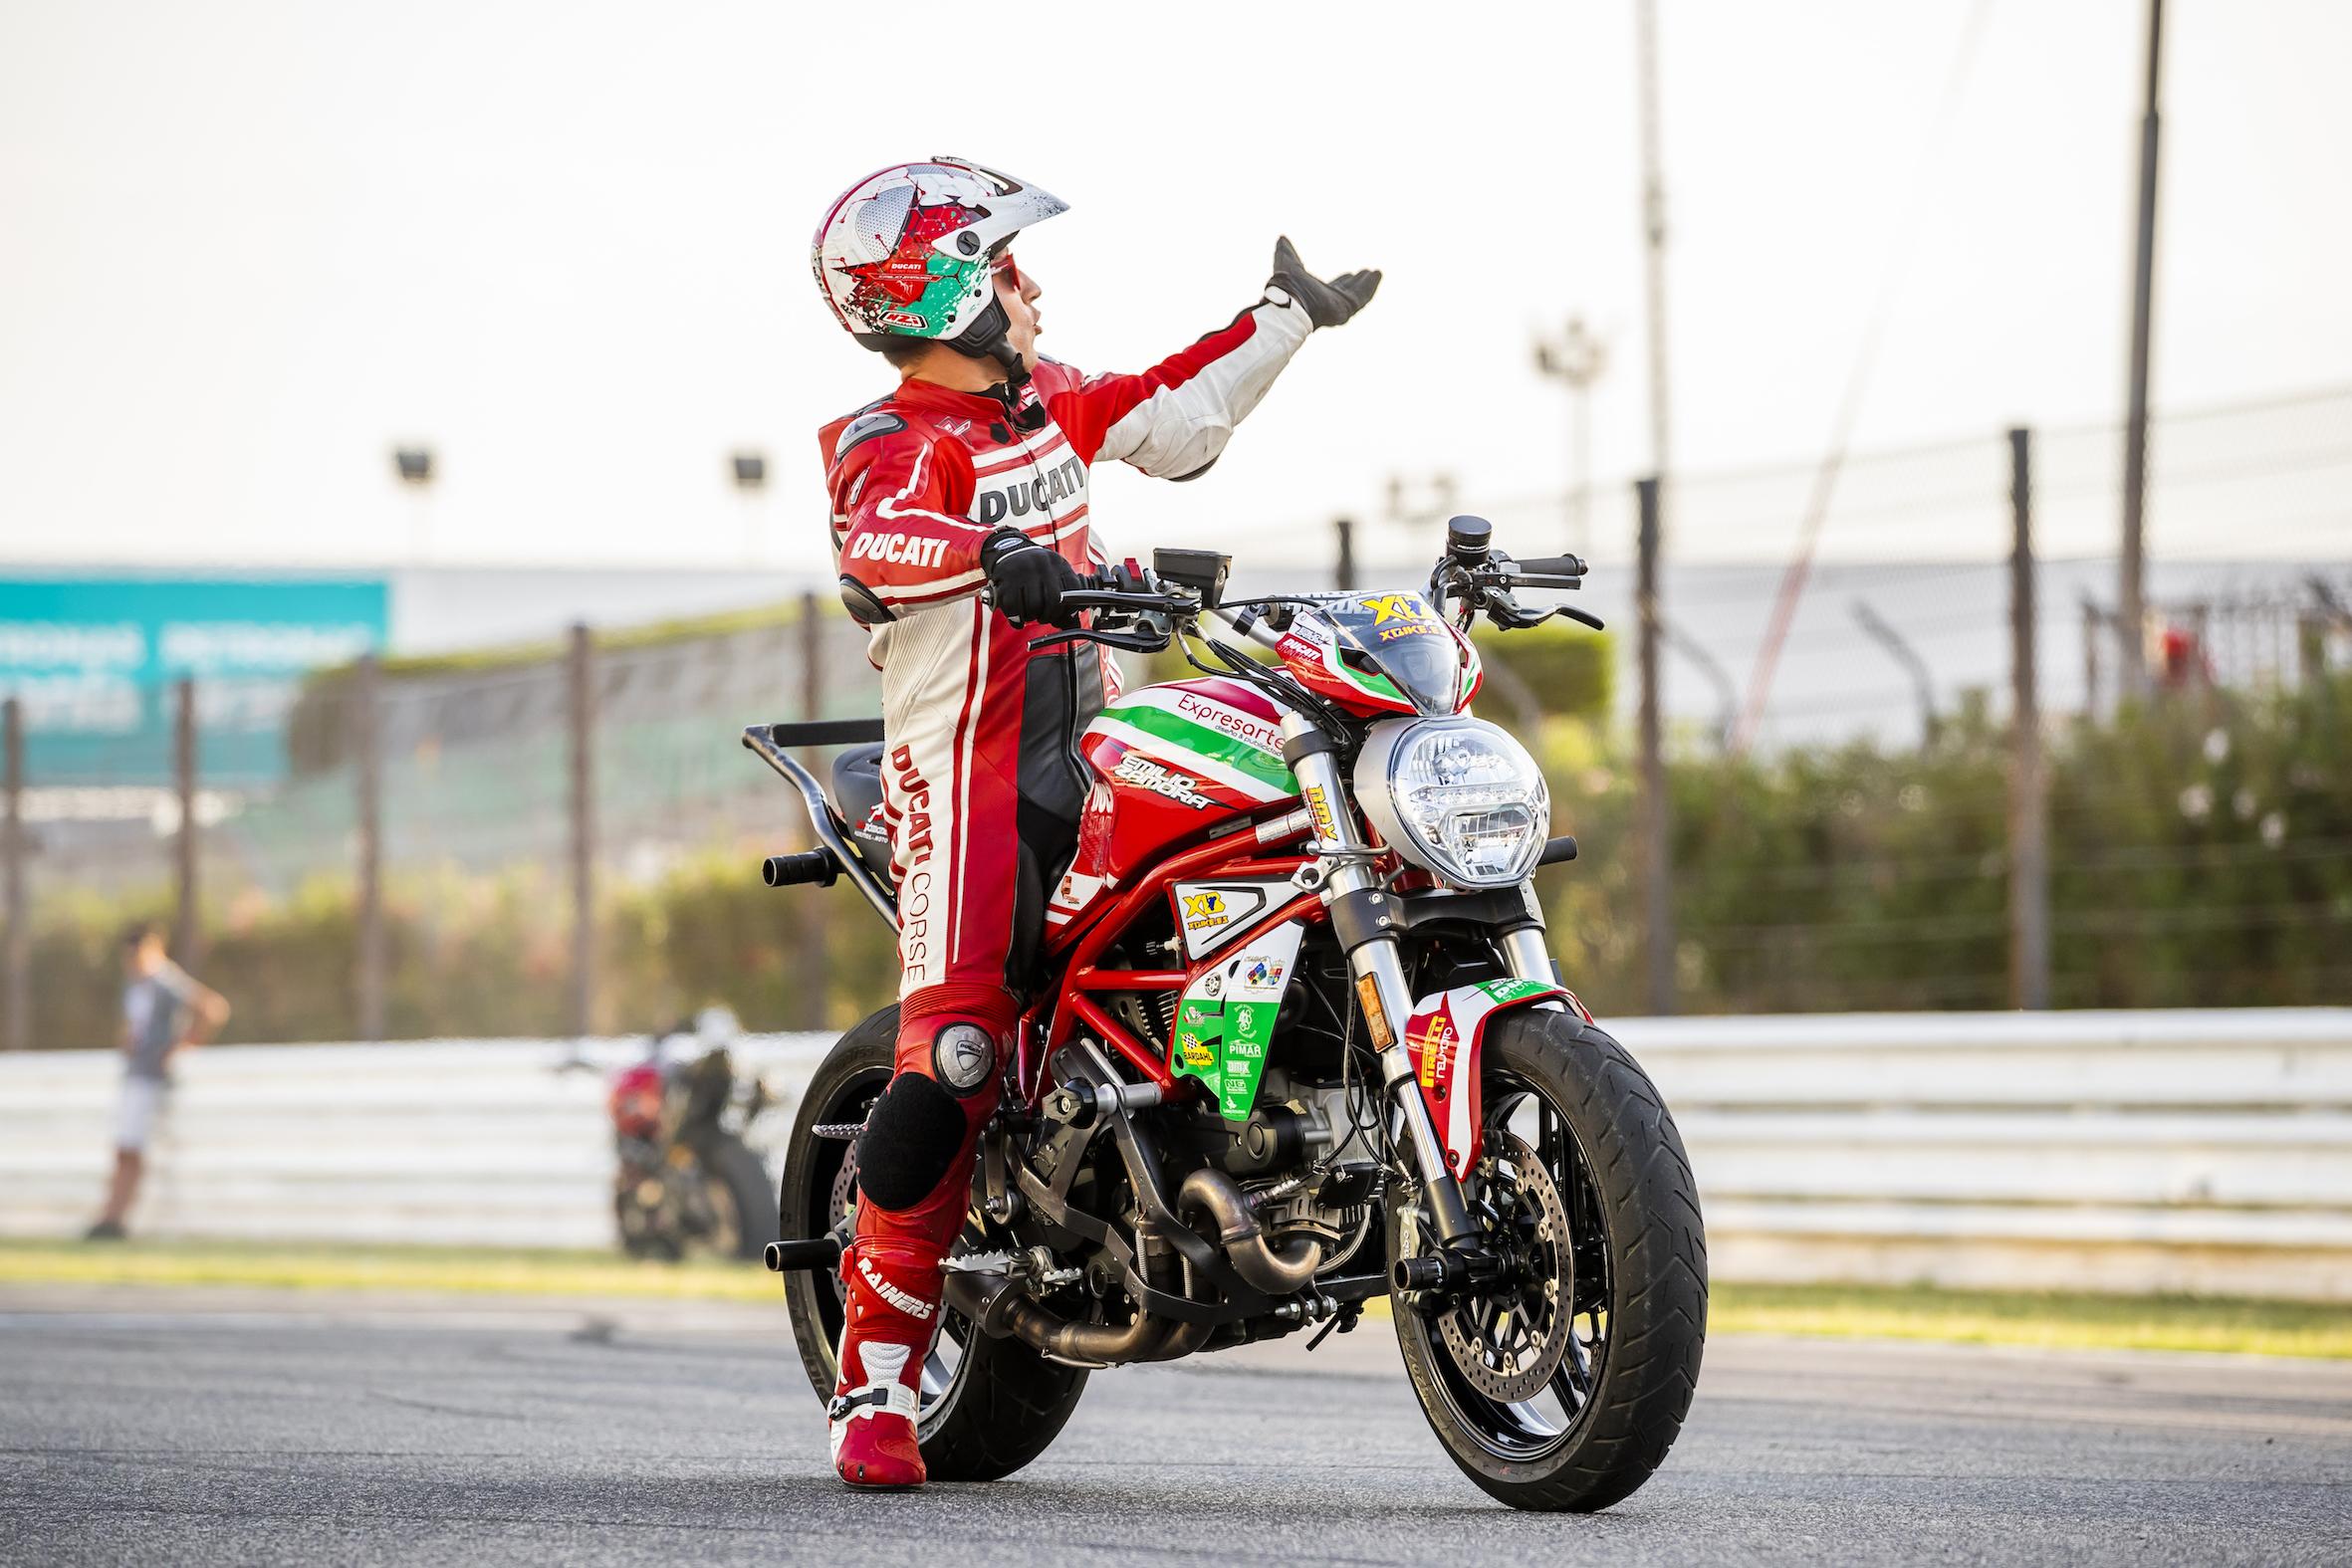 006_WORLD DUCATI WEEK_JUAN SANZ PHOTOGRAPHY_EMILIO_ZAMORA_STUNT_TEAM_MOTOR_SHOW_RIDER_MISANO_ITALIA_WDW 2018